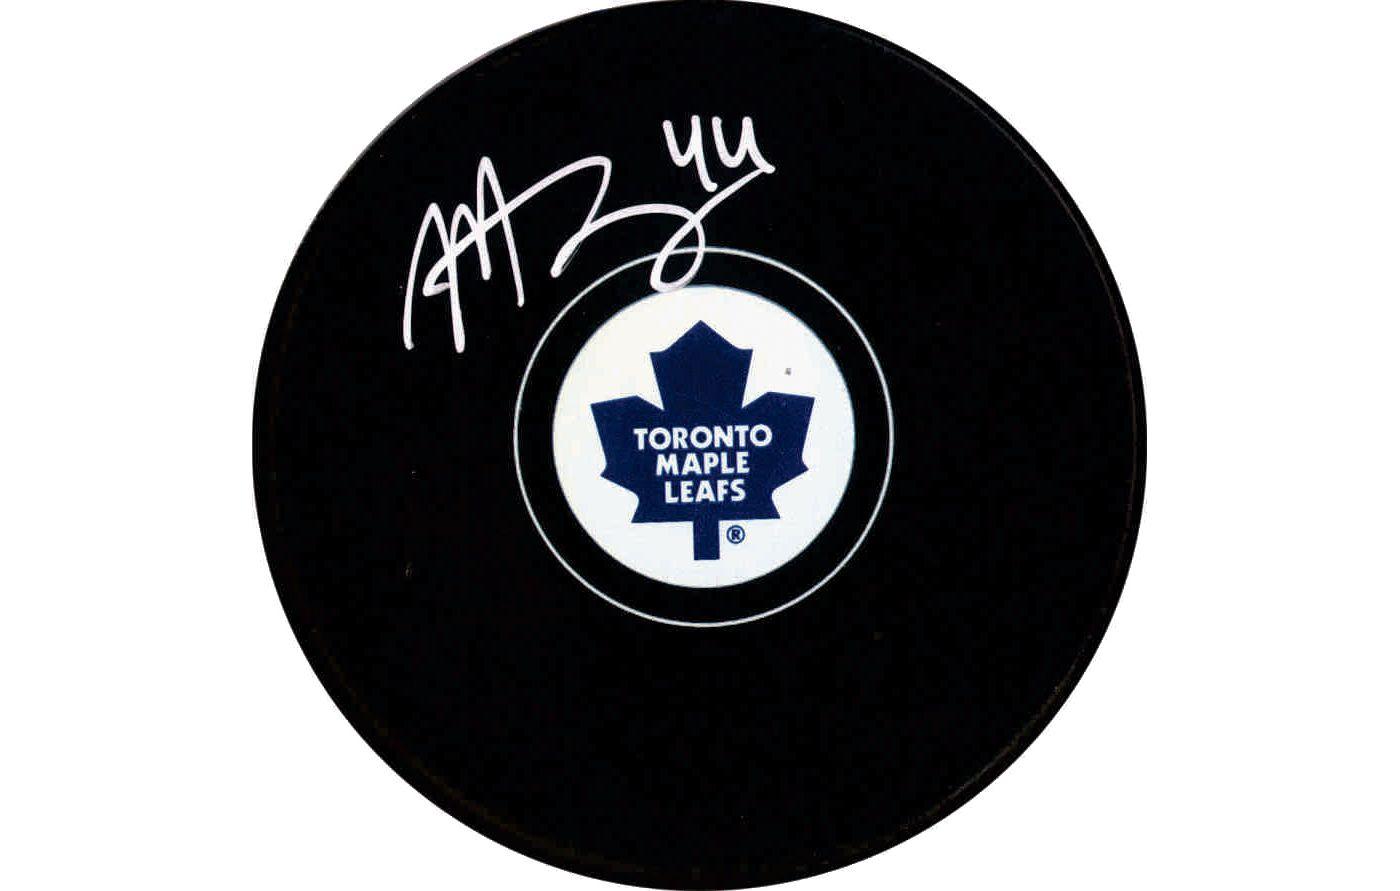 Frameworth Toronto Maple Leafs Morgan Rielly Signed Puck